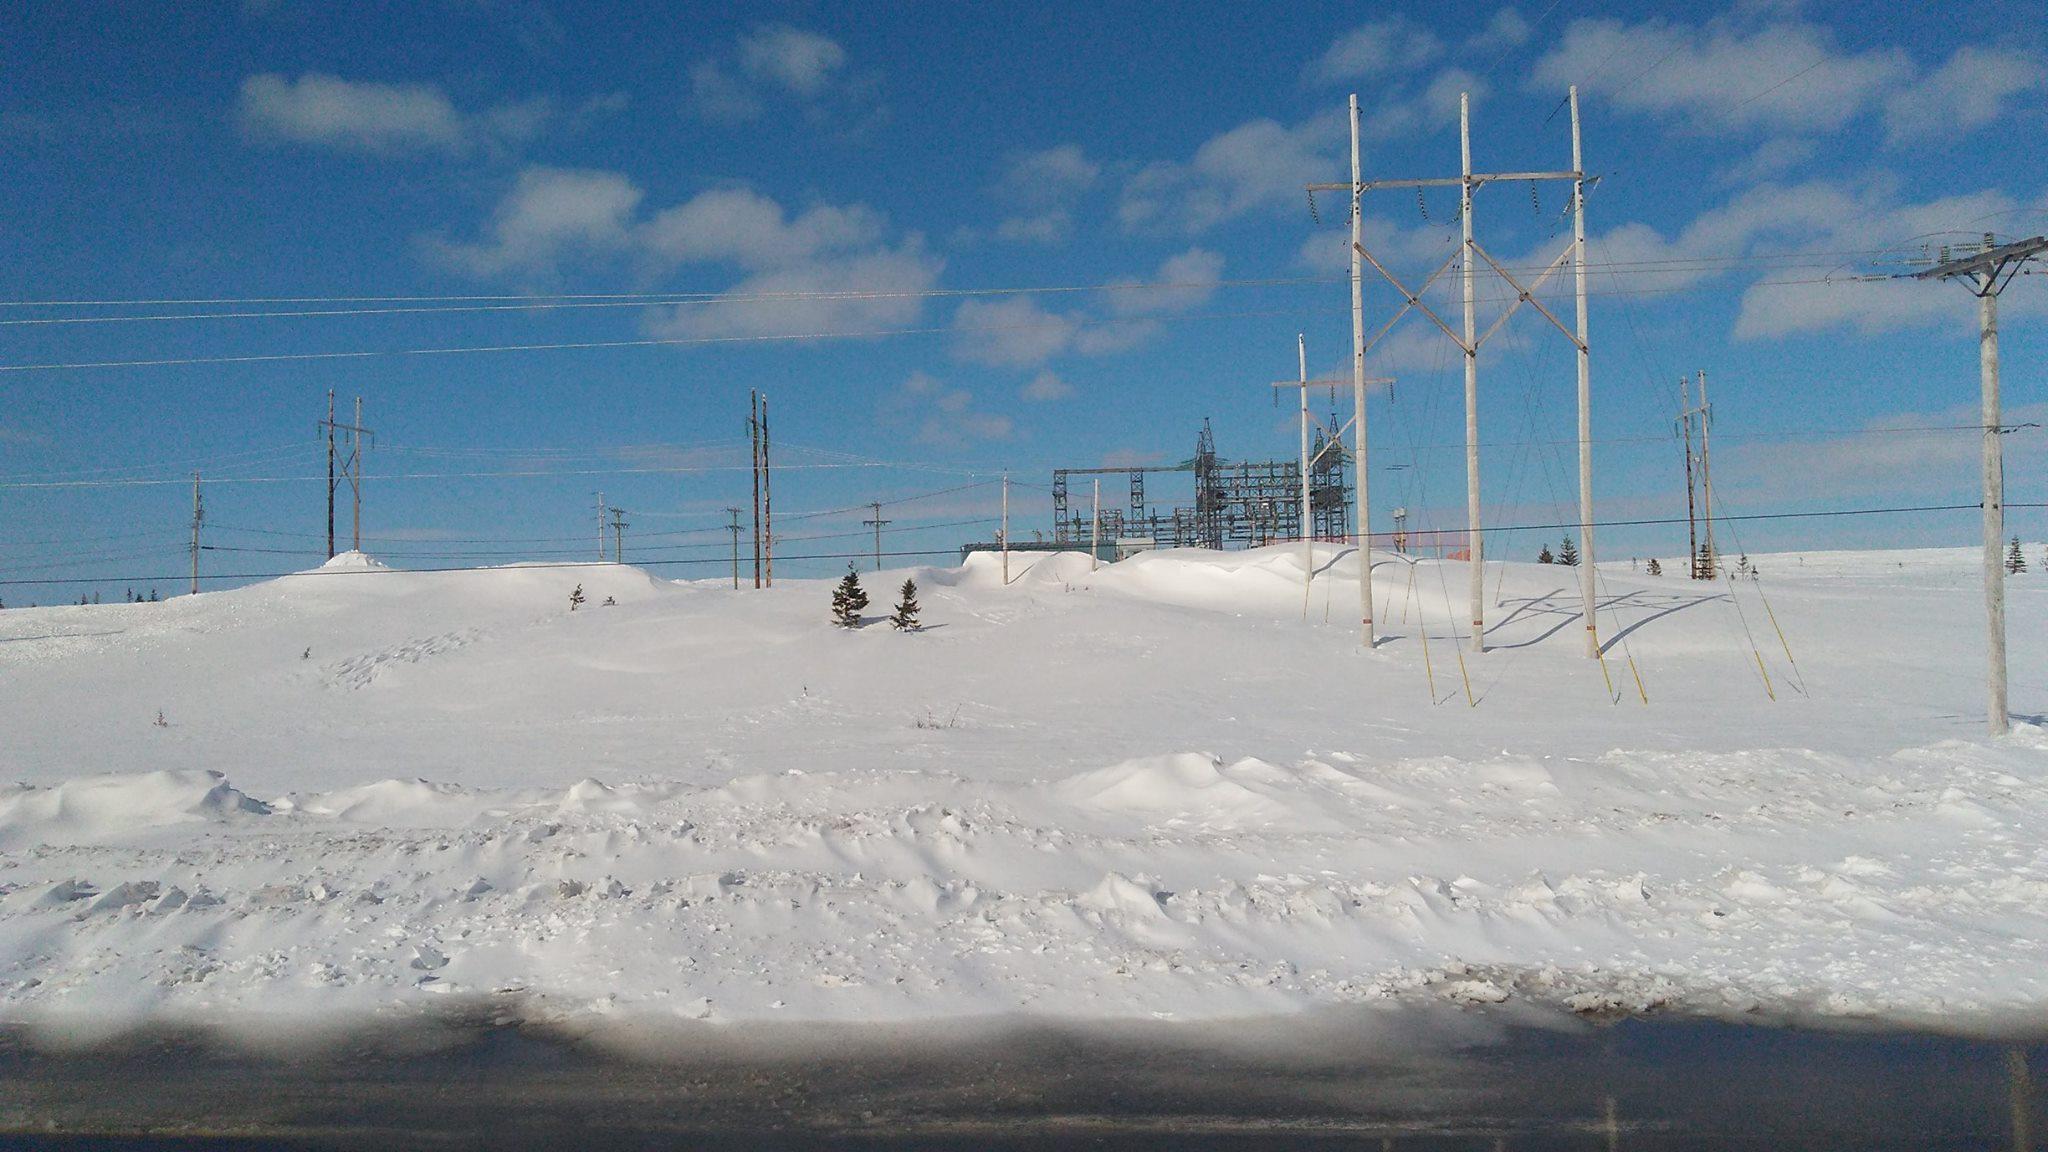 I-think-we-have-enough-snow-Newfoundland--8-4-2019--2